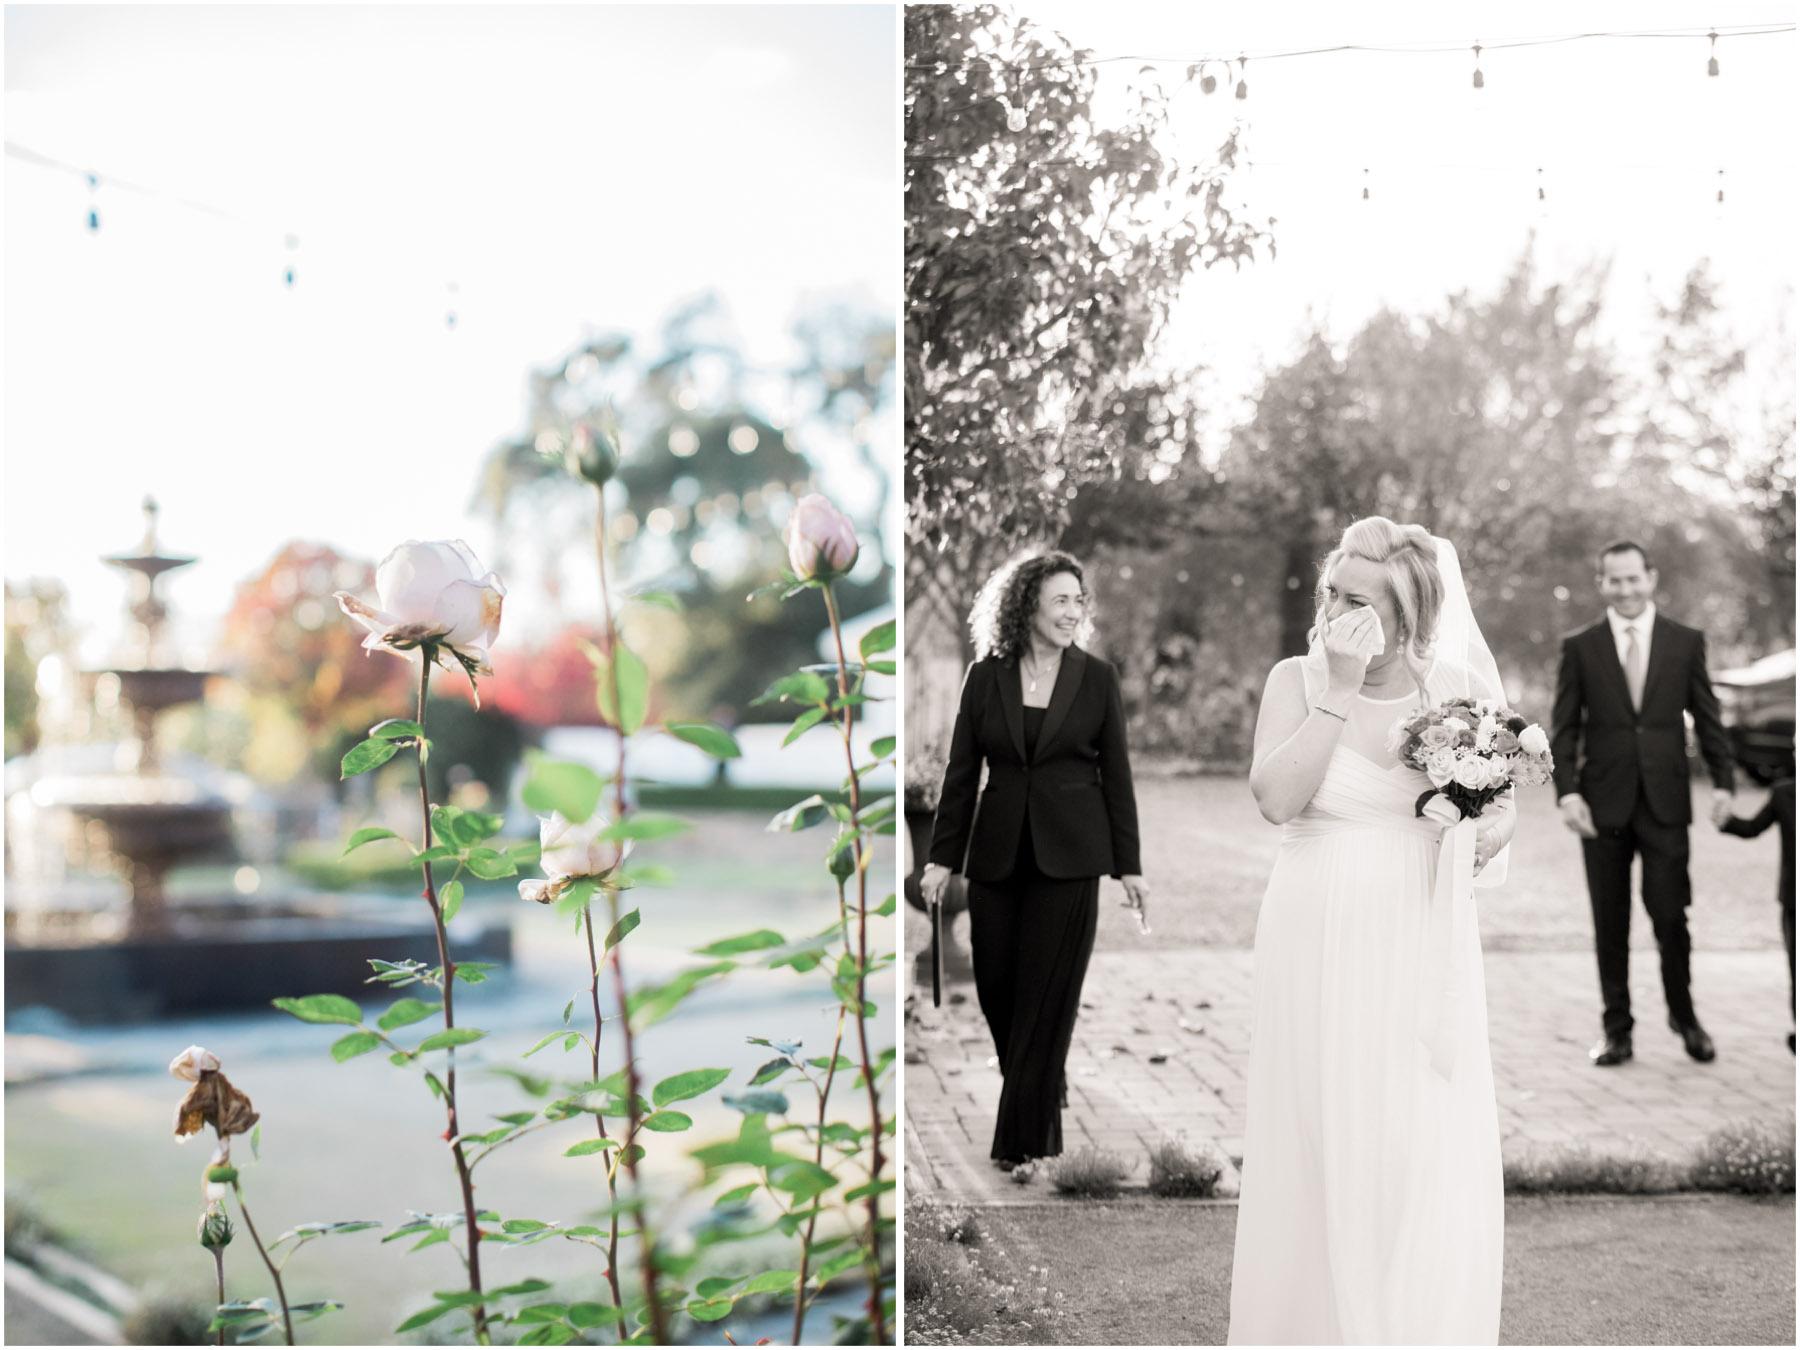 JennaBethPhotography-EDWedding-1.jpg